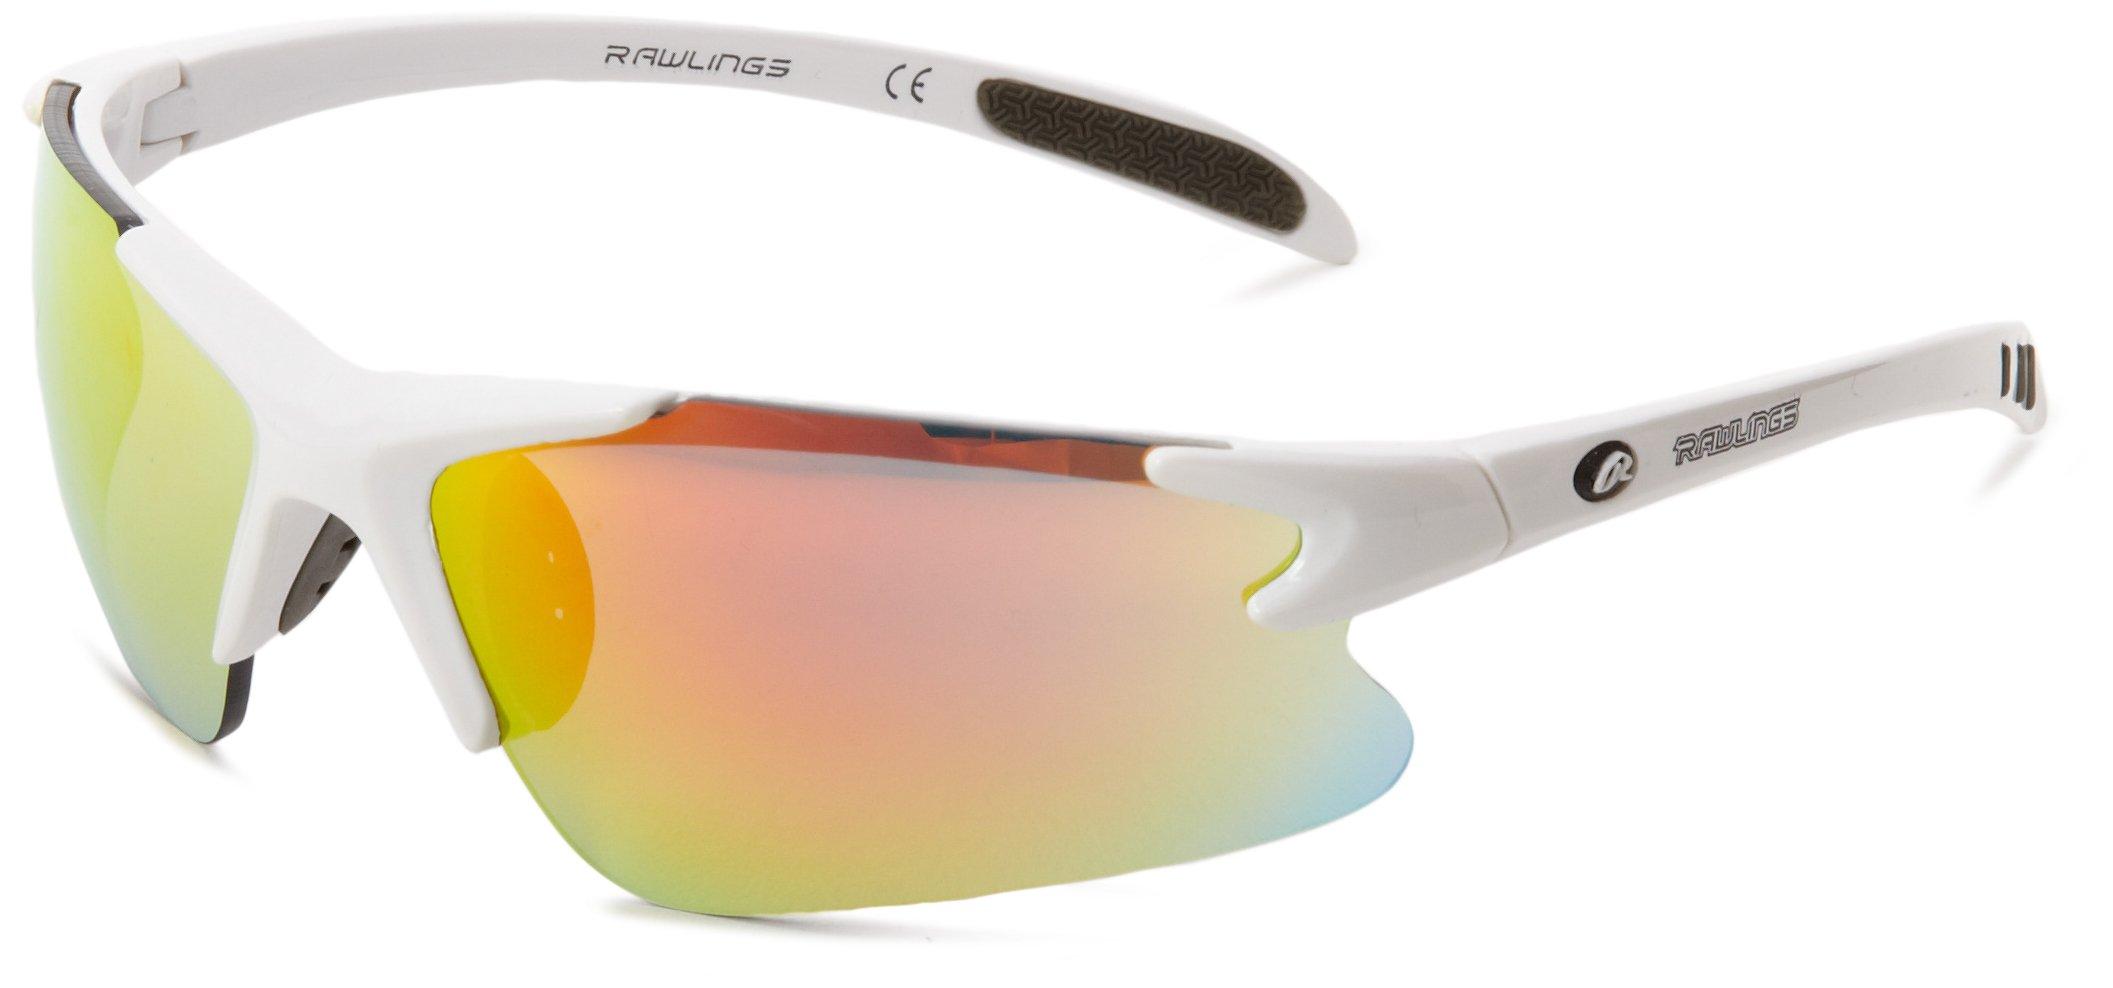 Rawlings RY103 Semi-Rimless Sunglasses,White,91 mm